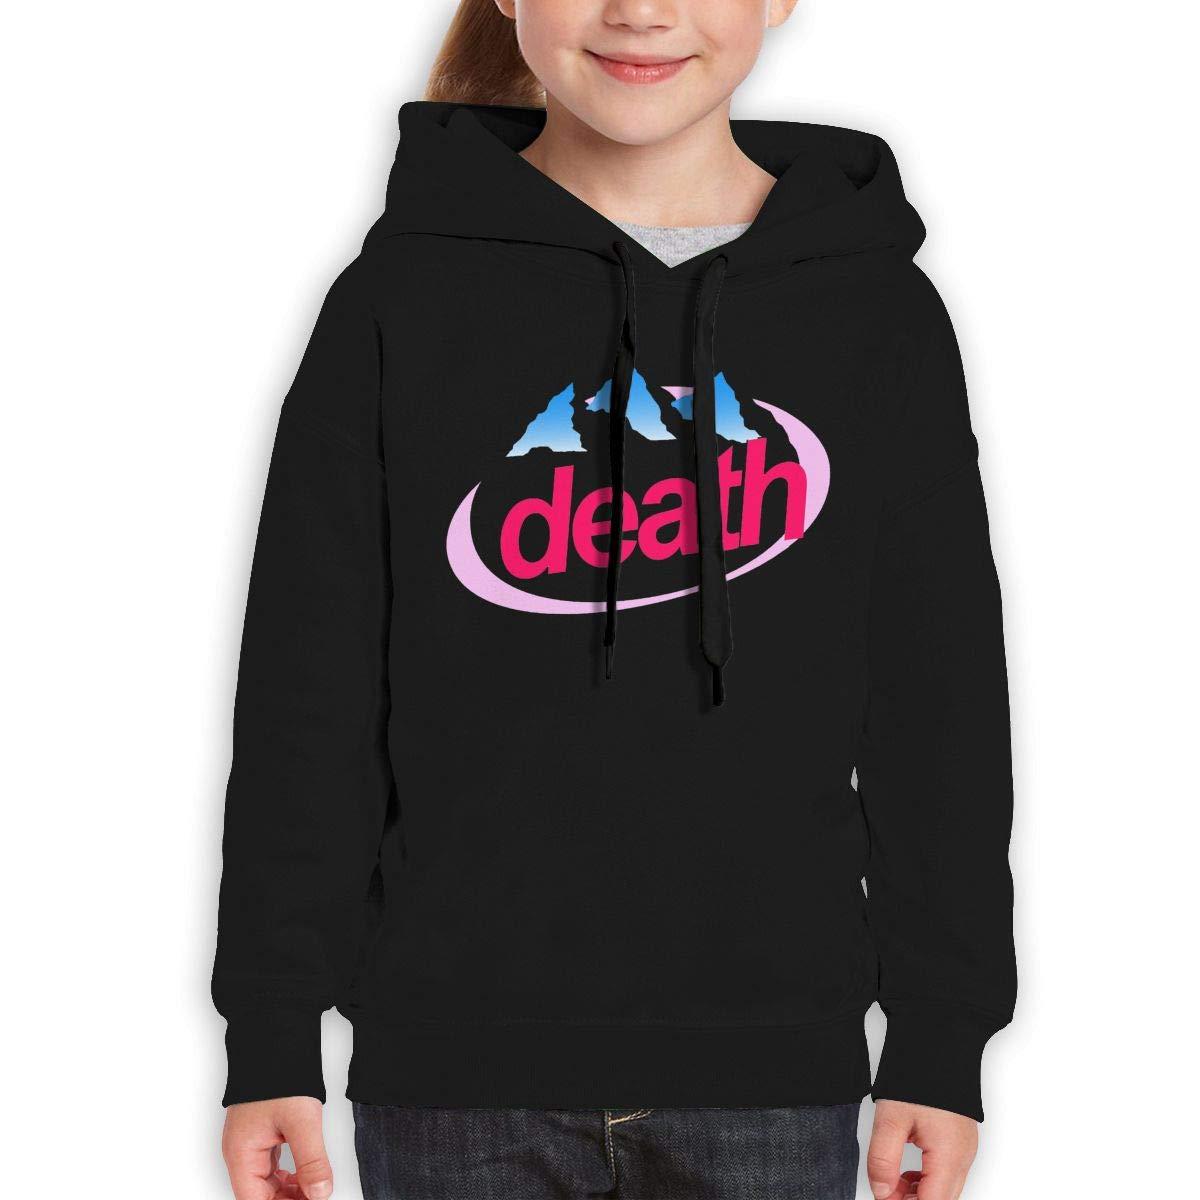 MUPTQWIU Girl Death Evian Cyberpunk Casual Style Climbing Black Sweater